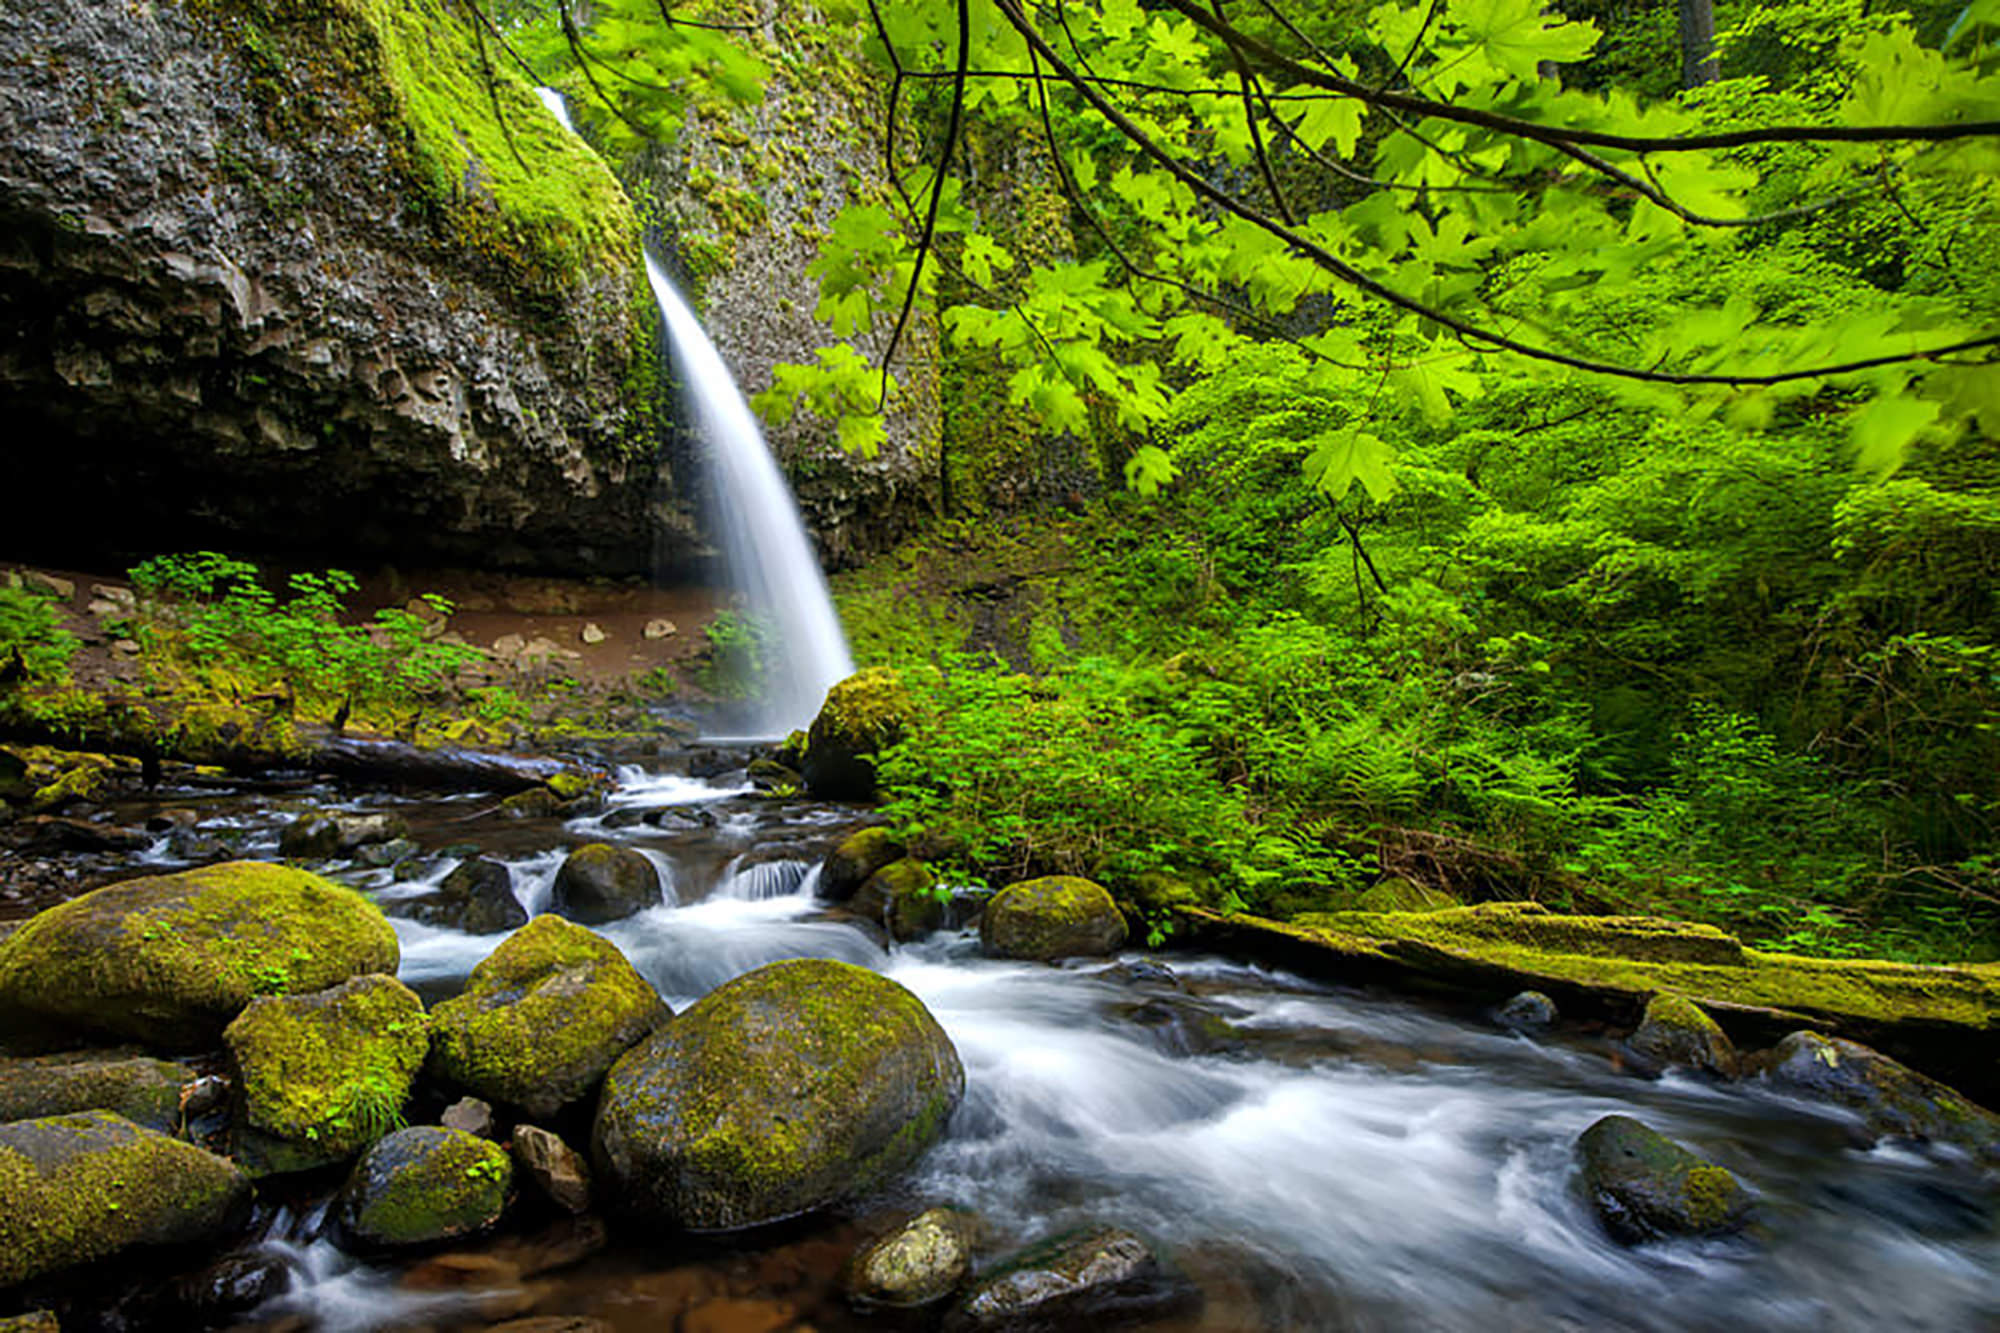 Ponytail Falls - Columbia Gorge, OR